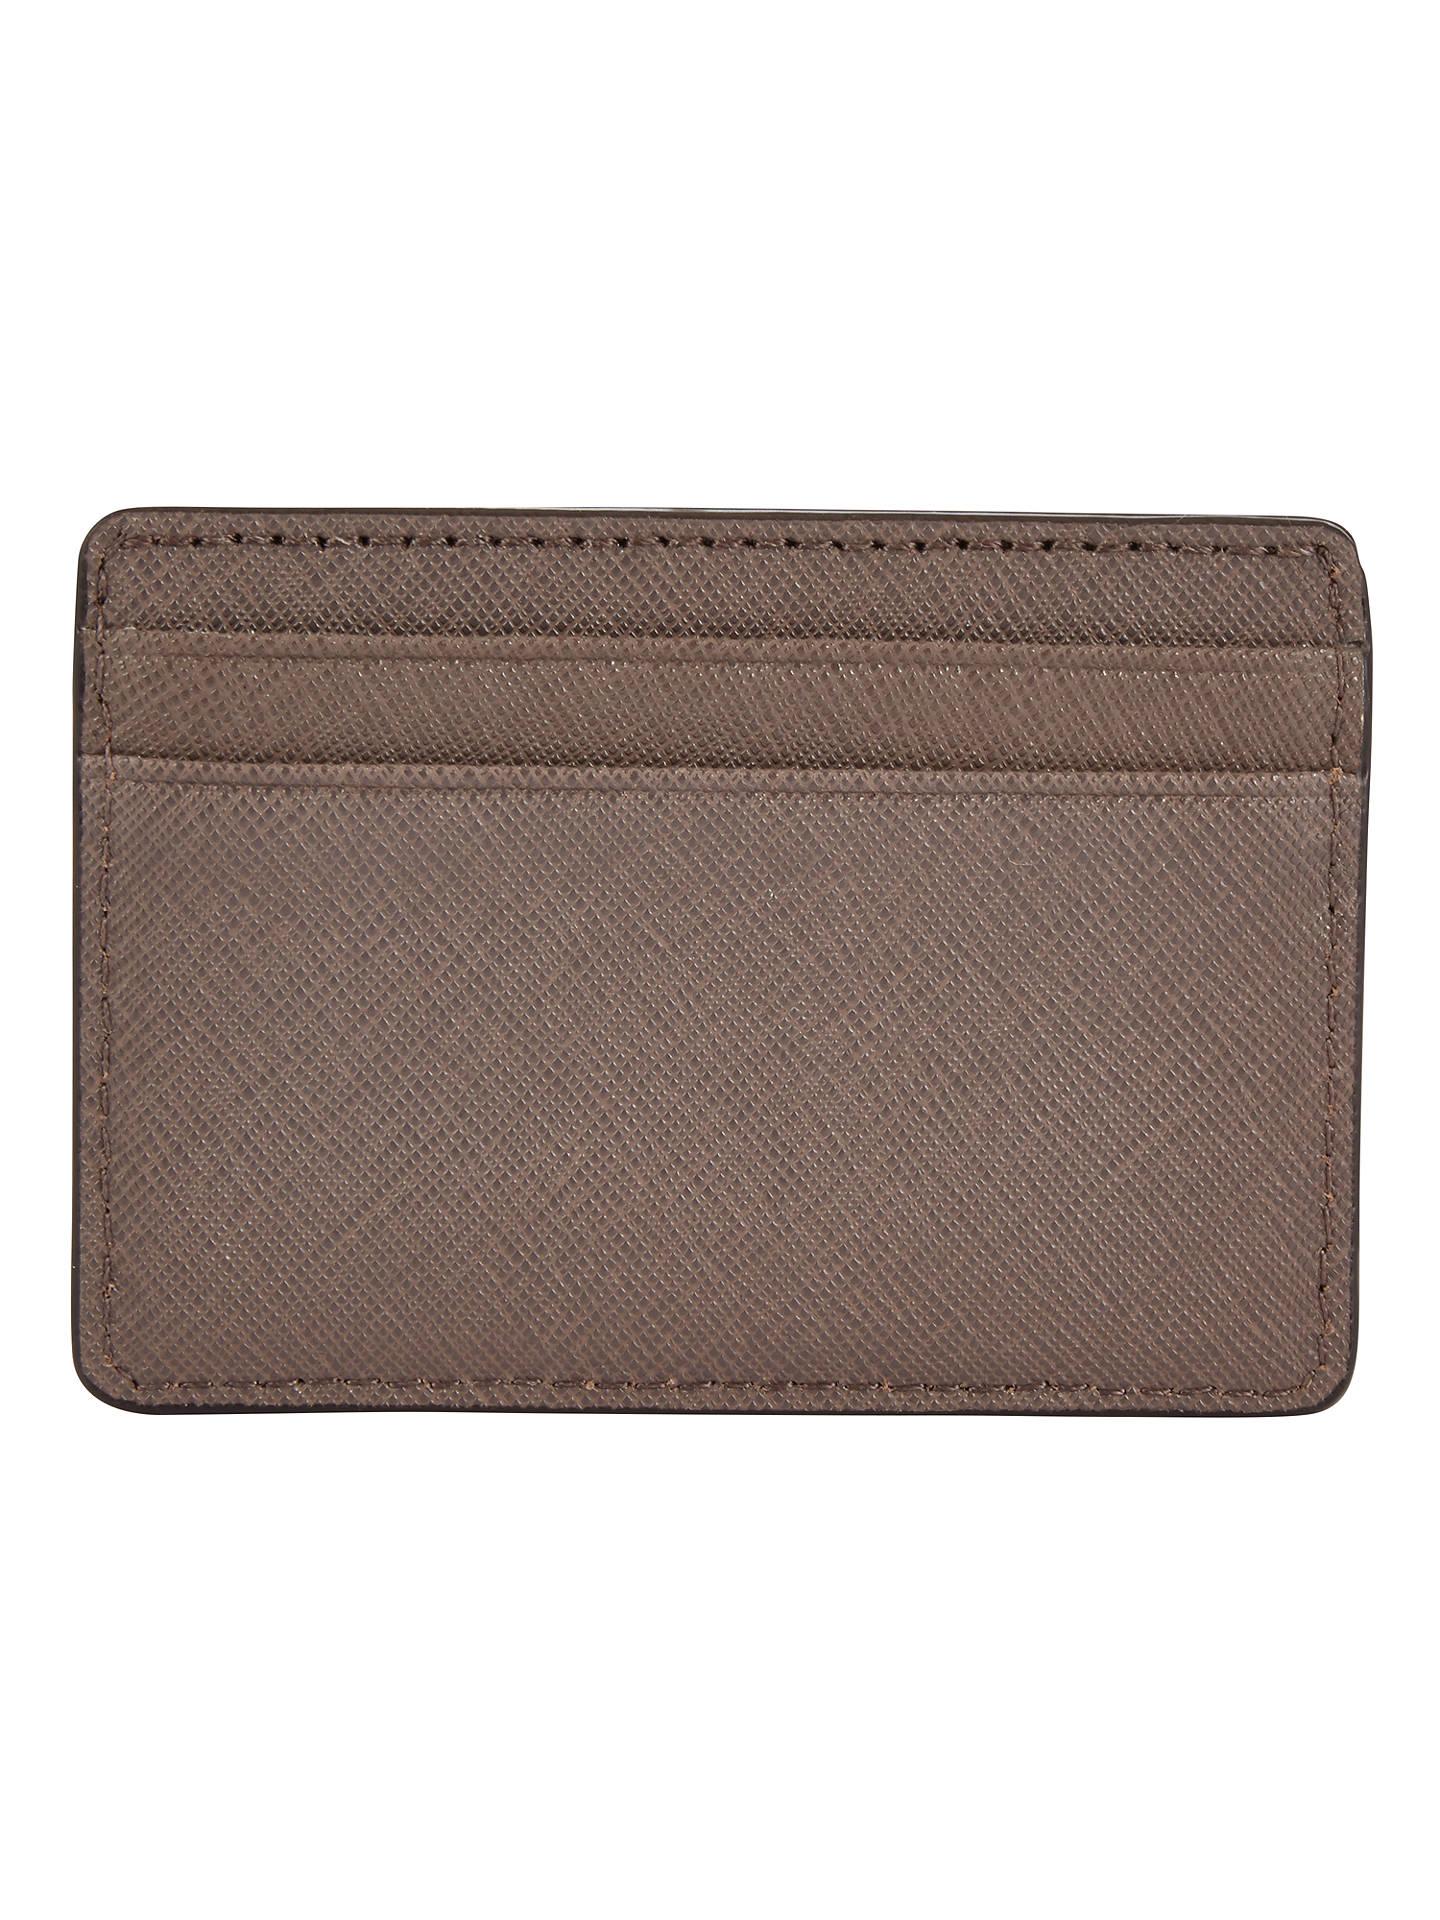 MICHAEL Michael Kors Jet Set Travel Leather Card Holder at ...